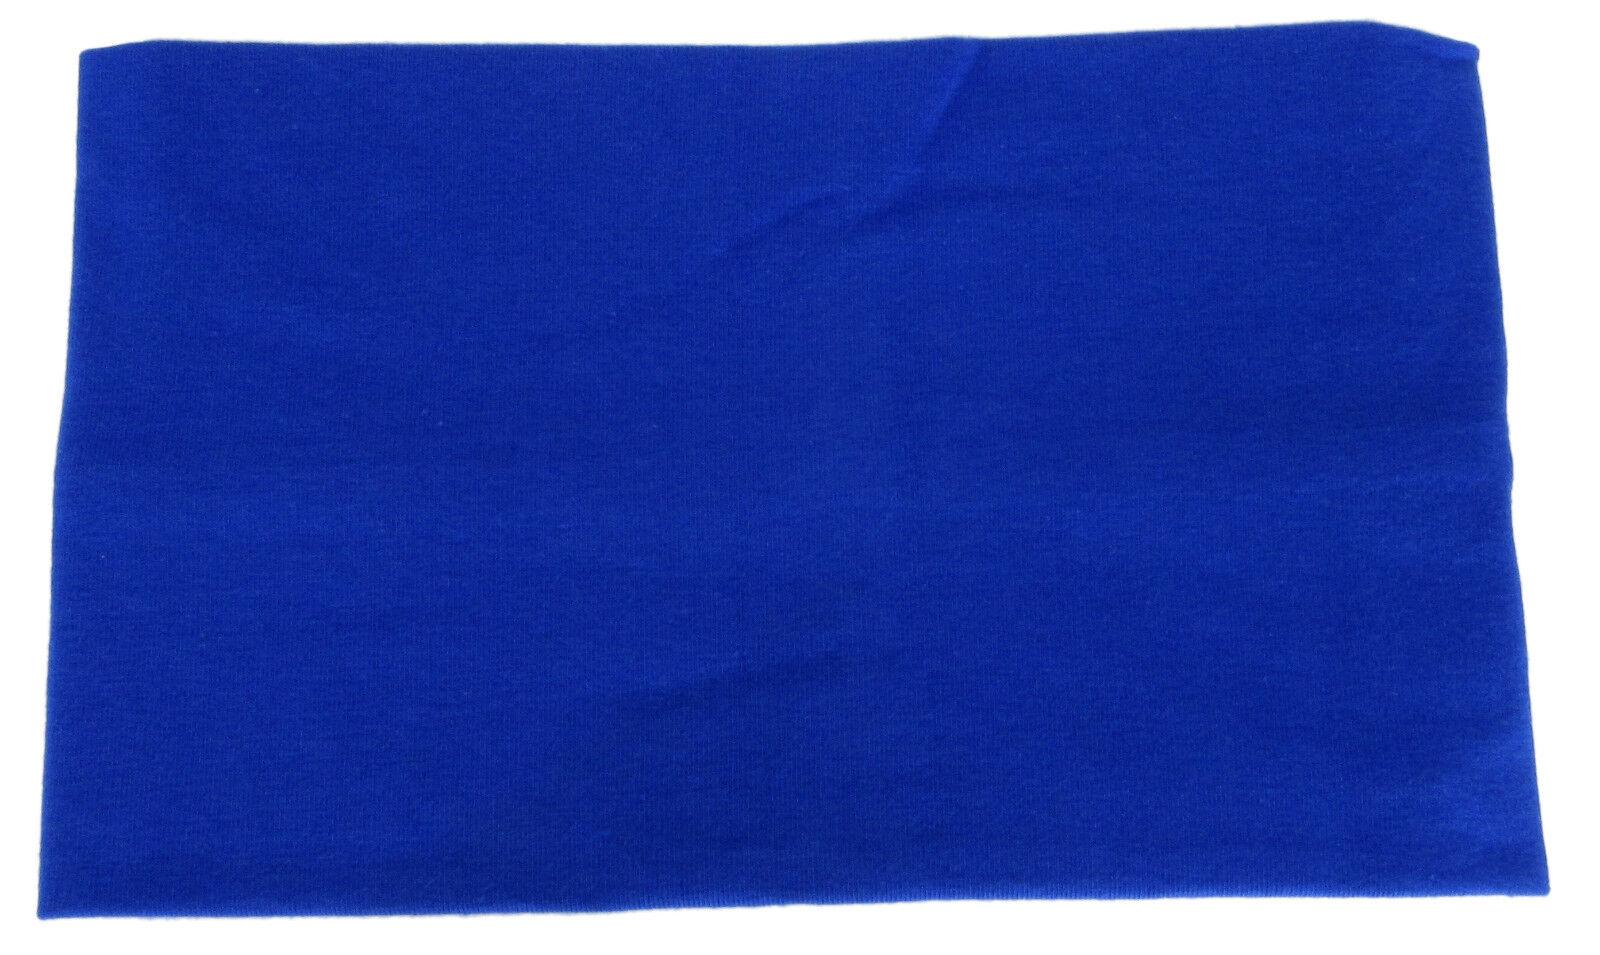 Cotton Soft Stretch Headbands Yoga Softball Sports Hair Band Wrap Sweatband Head